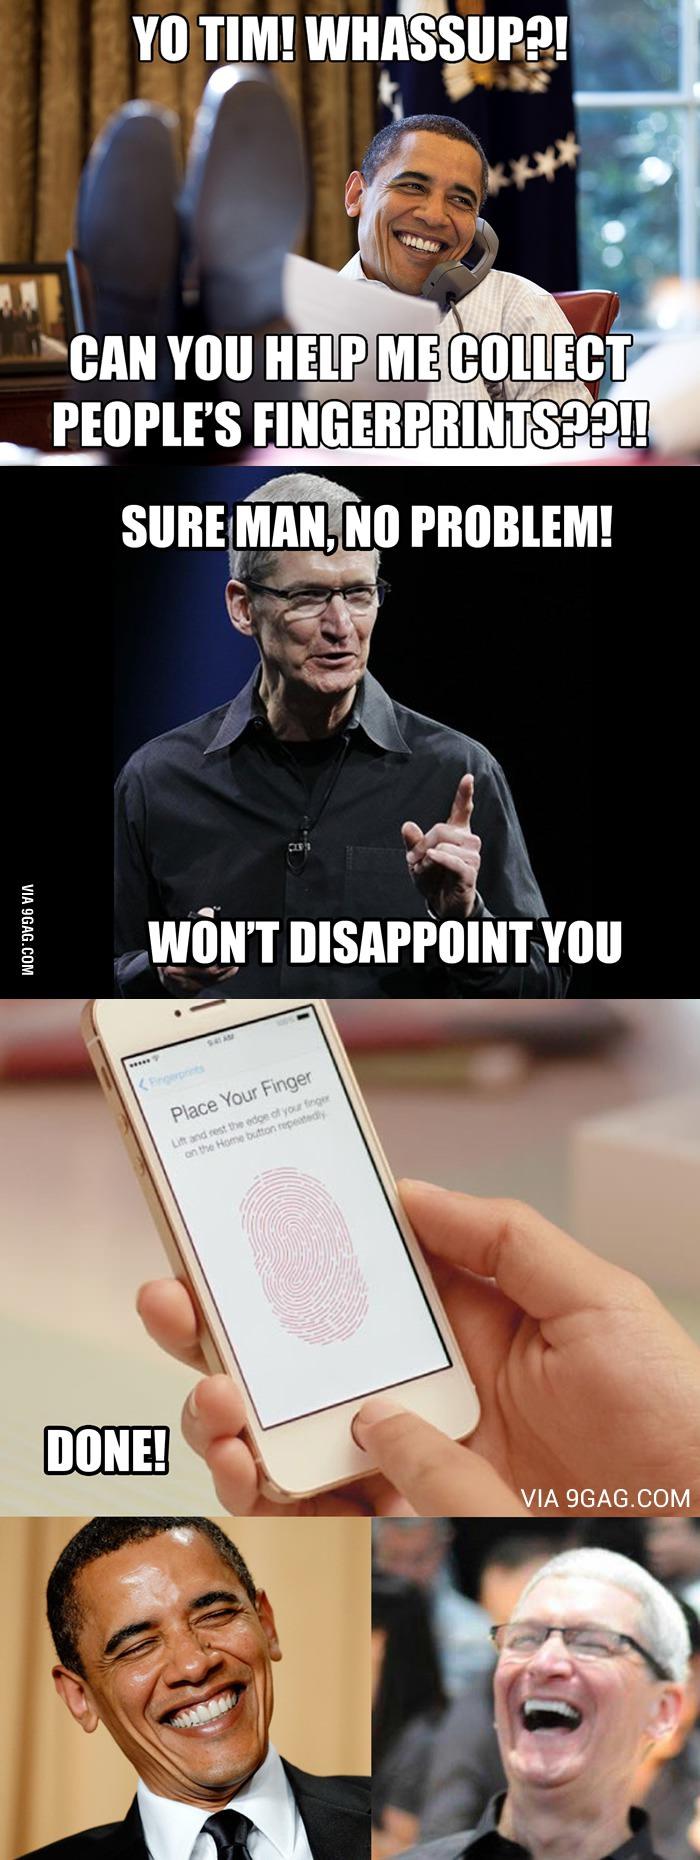 meme, fingerprints, iphone, true story, apple, iphone